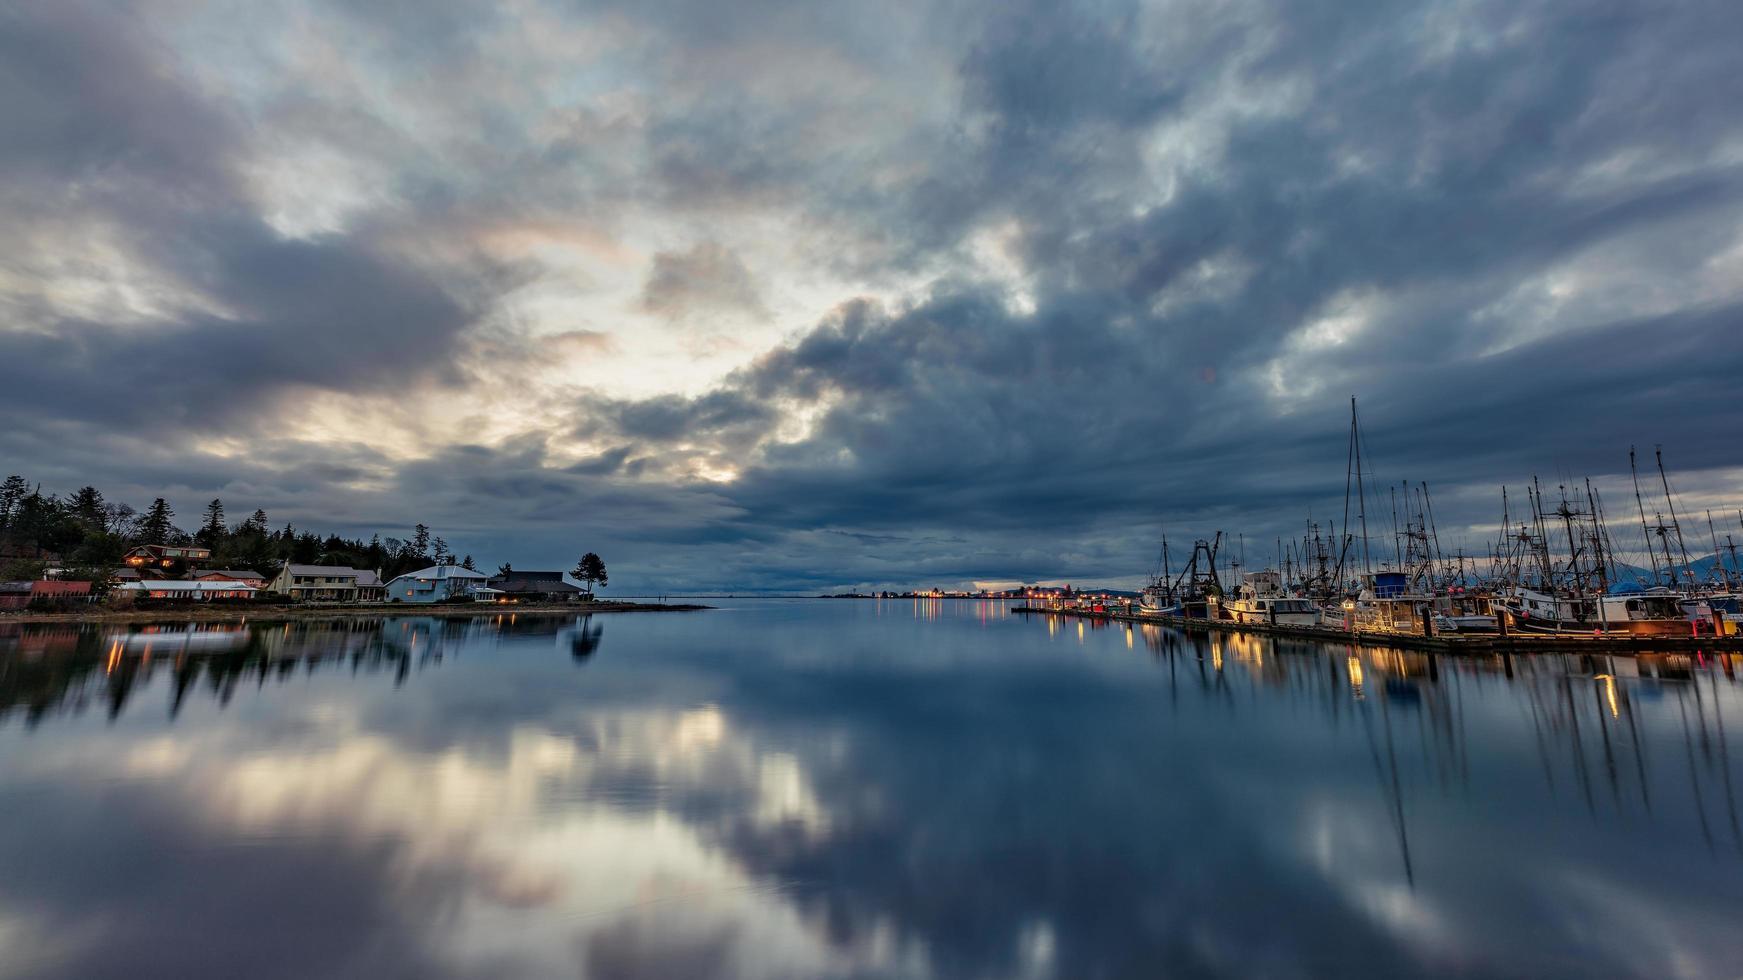 Gewässer unter bewölktem Himmel foto